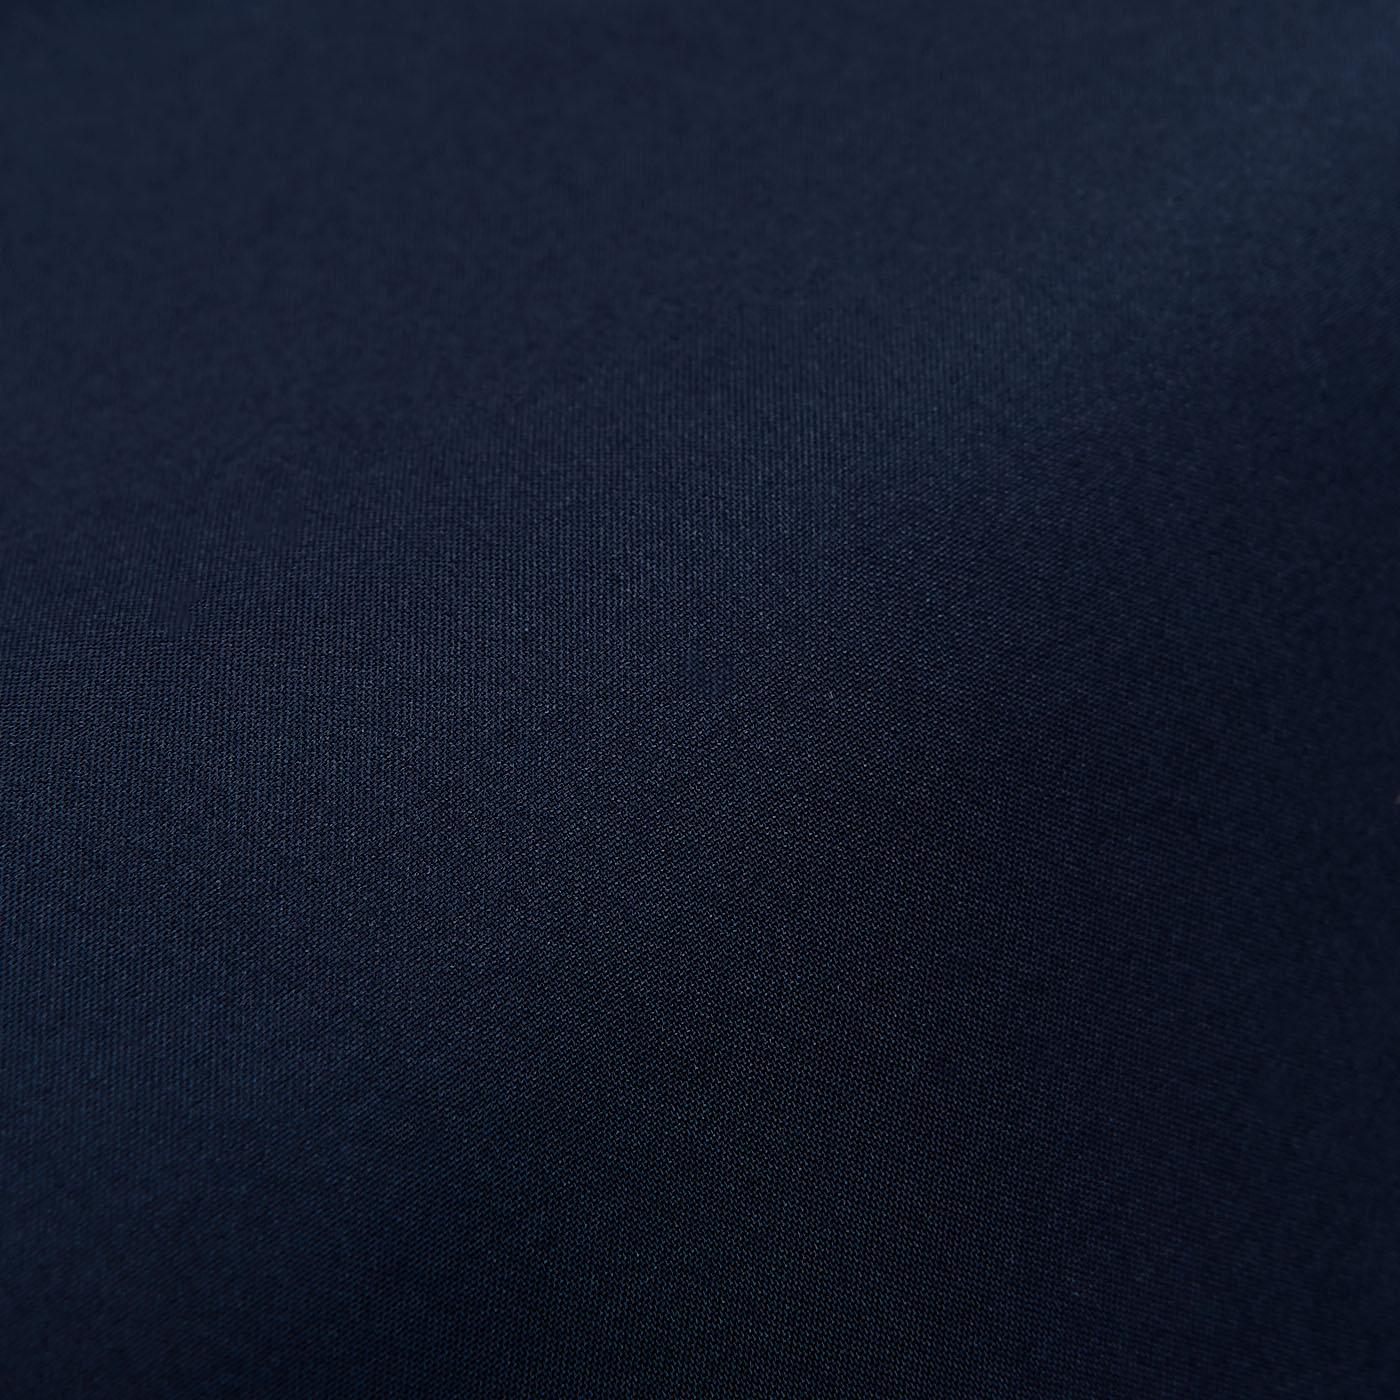 Fedeli Navy Madeira Microfiber Swim Shorts Fabric